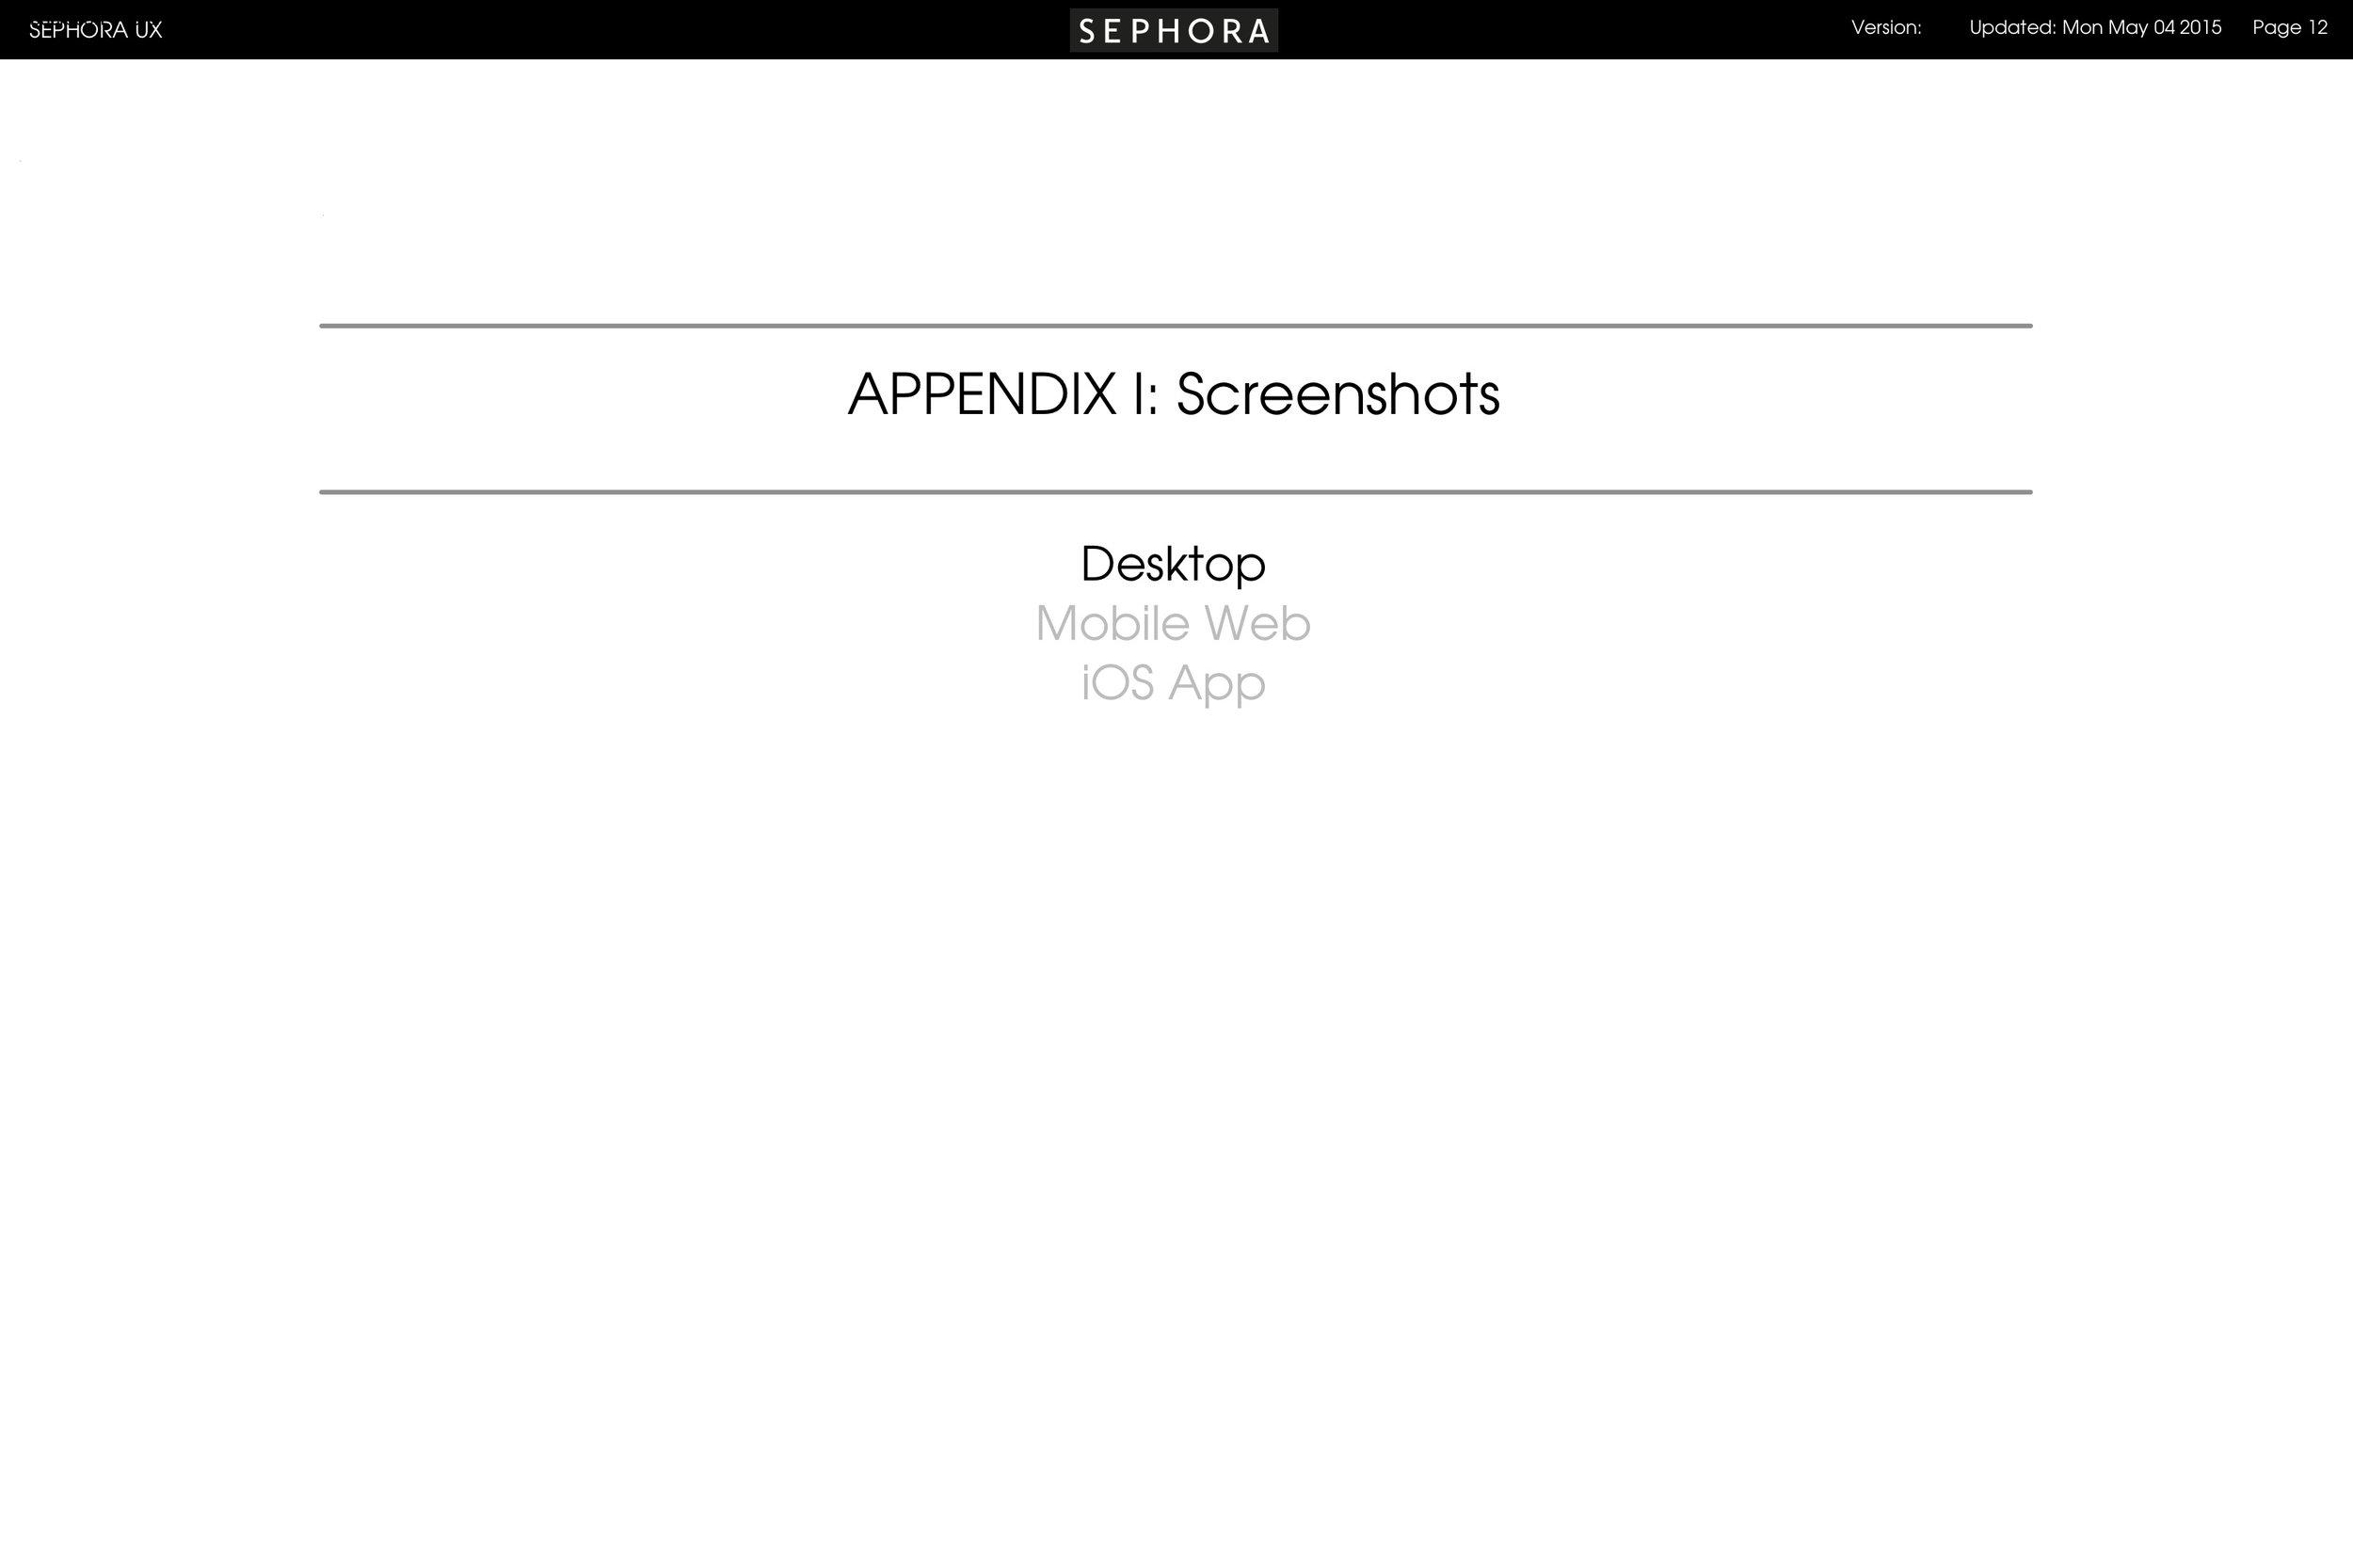 Sephora_SignIn_Benchmark_11.jpg